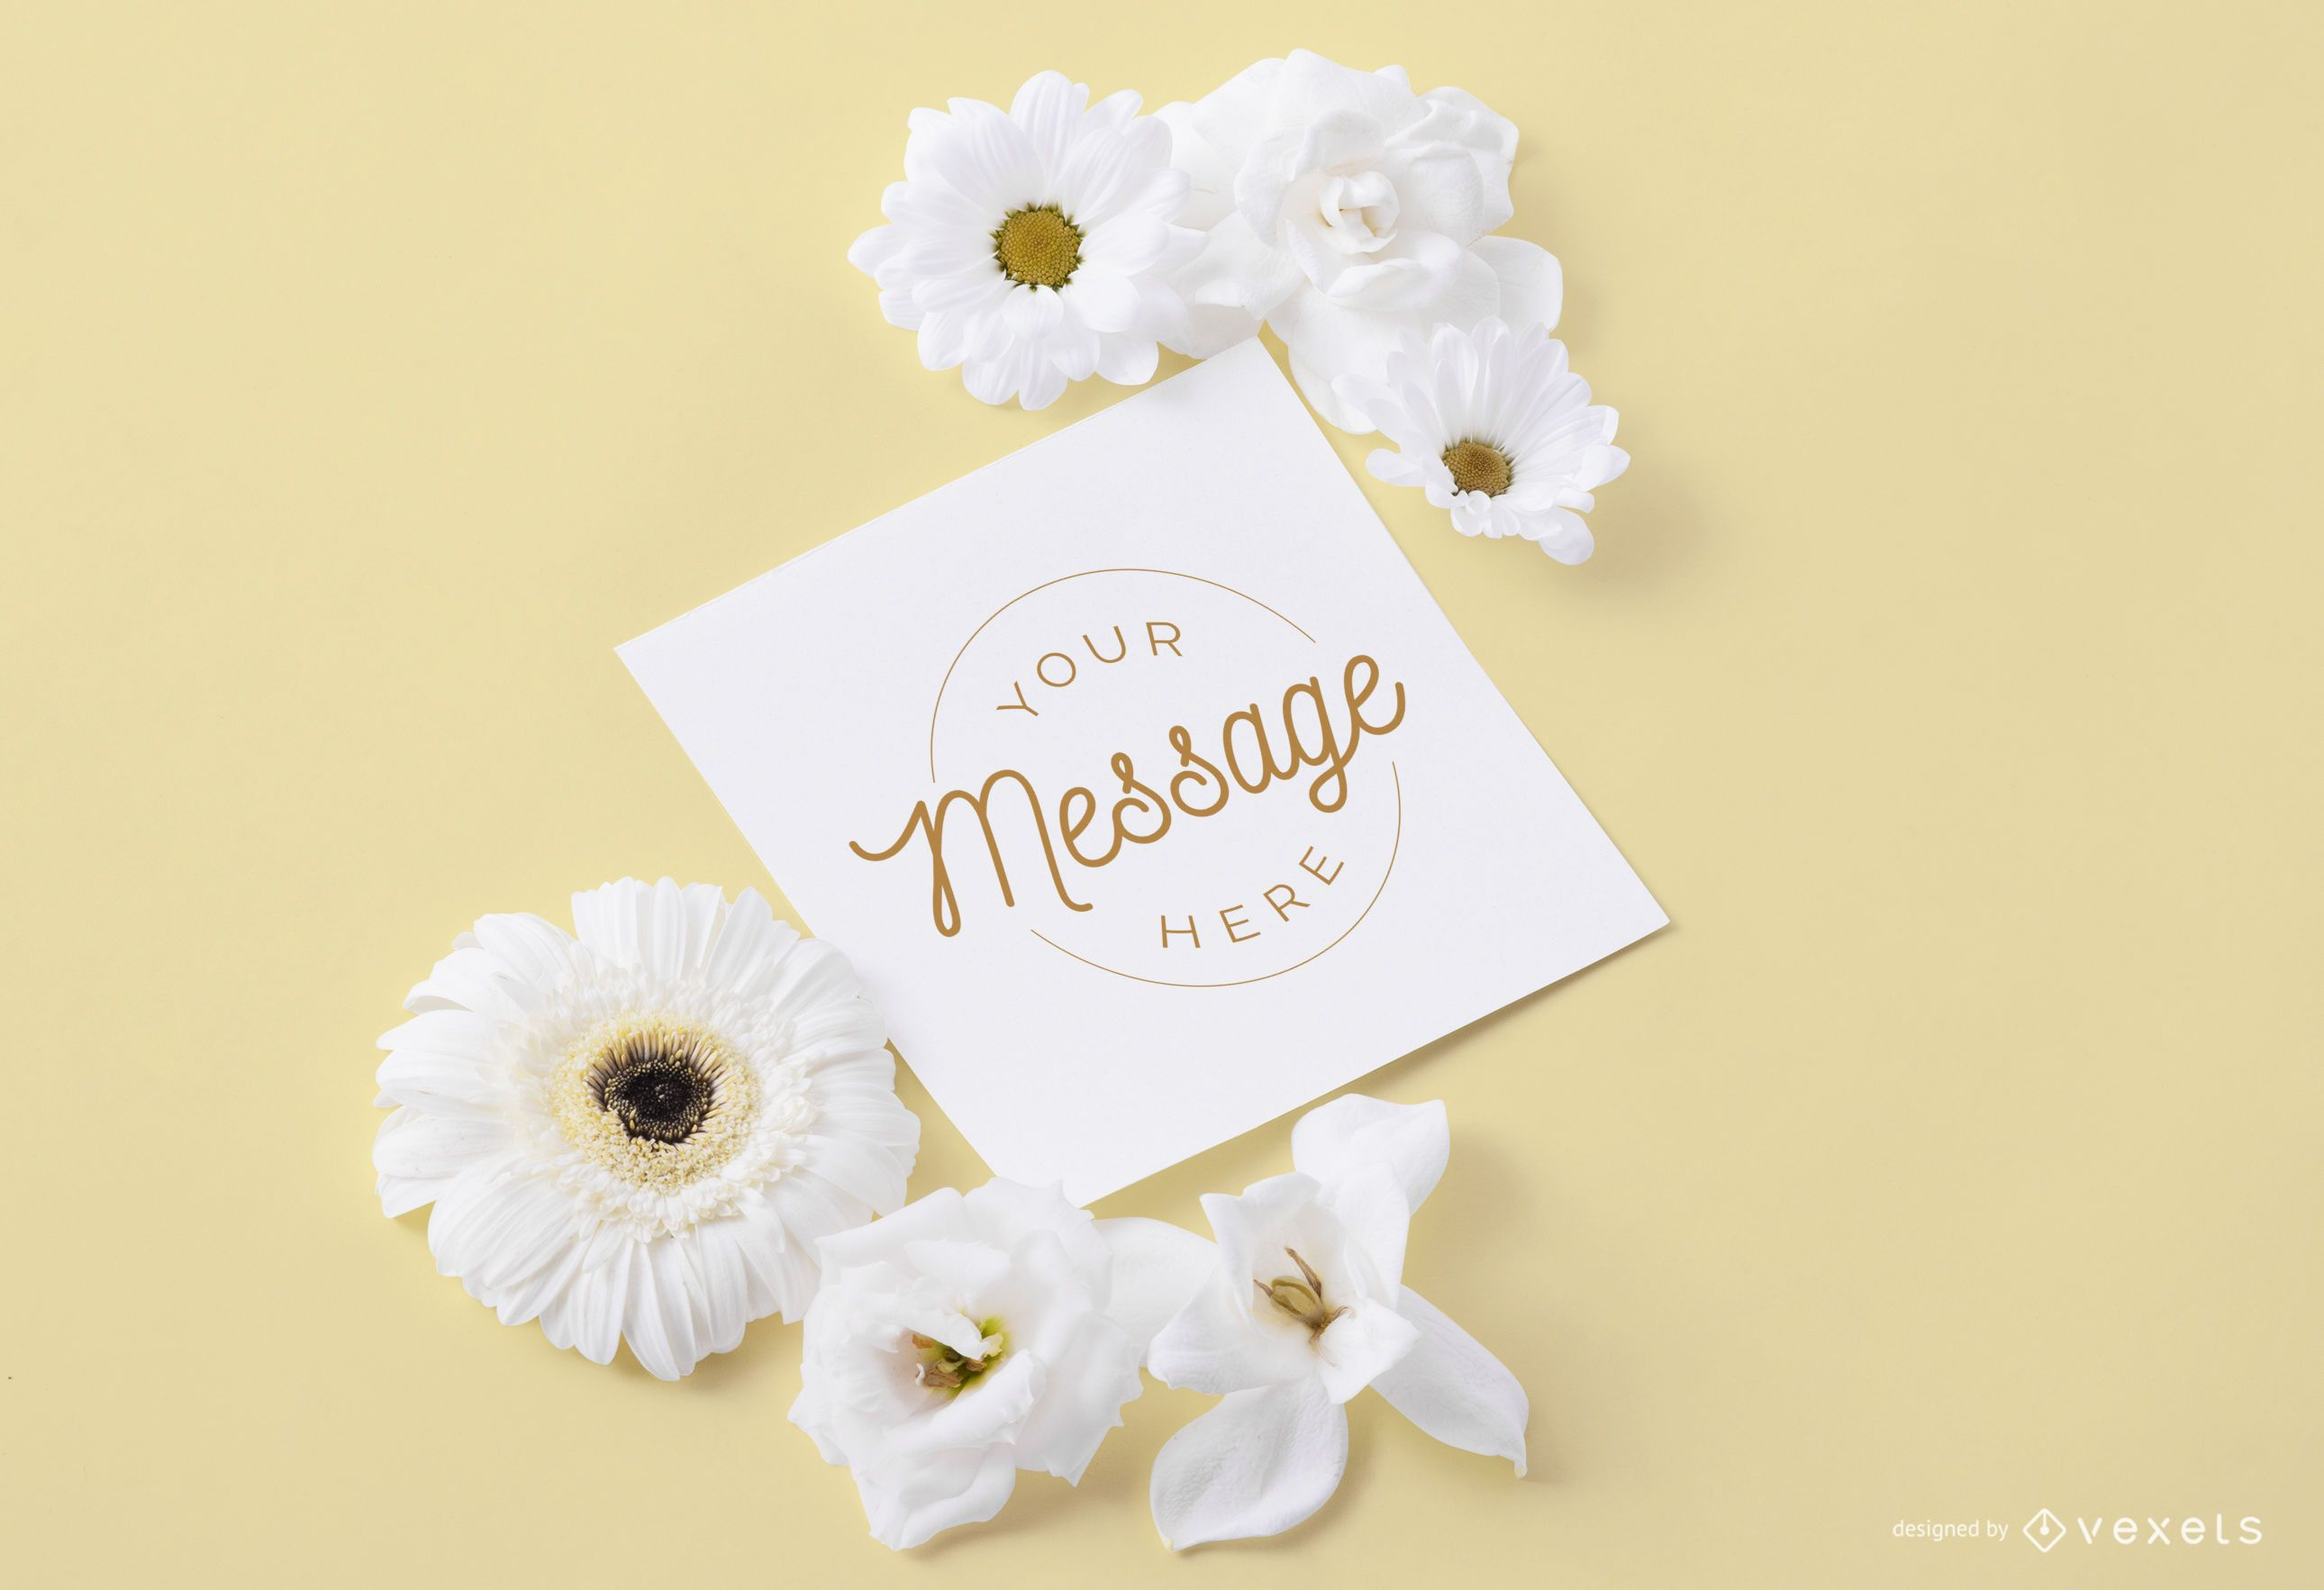 Card with flowers around mockup